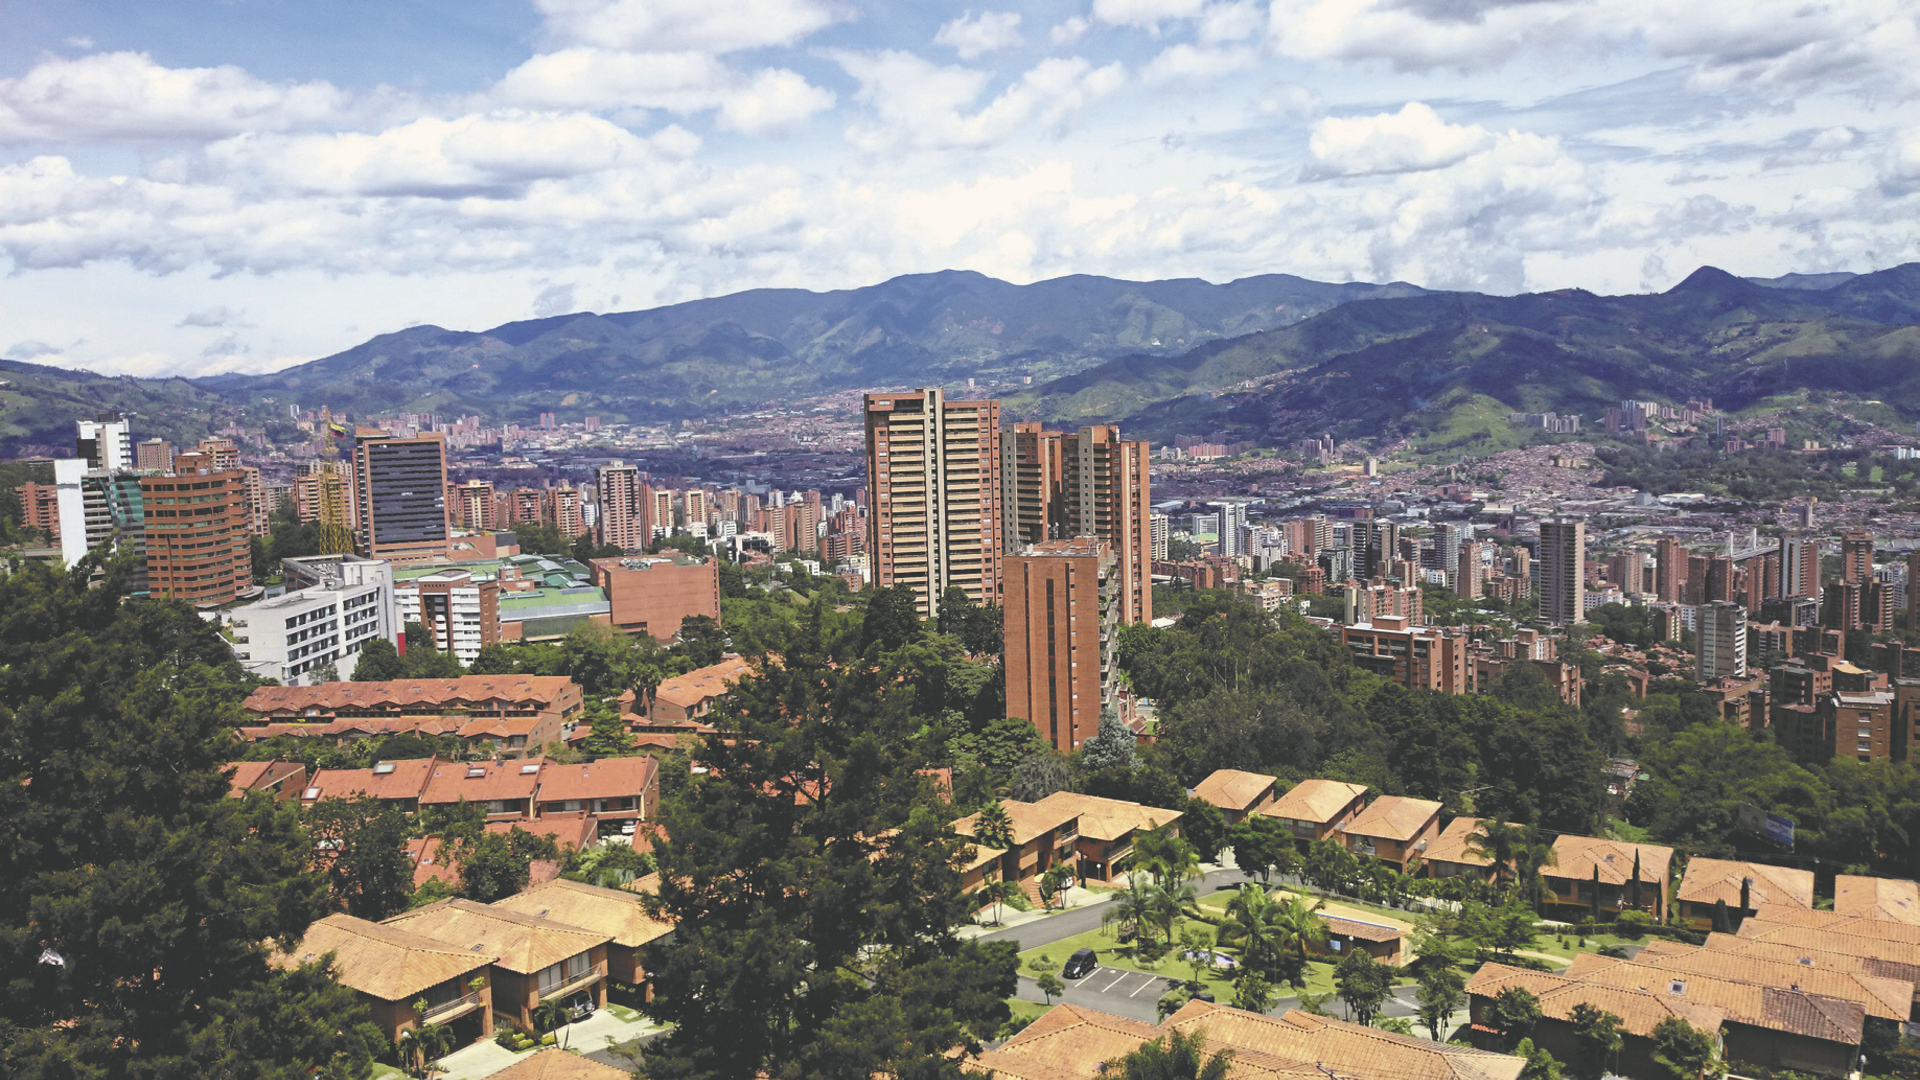 Blick auf Medellin, ©camaralucida1 - Fotolia